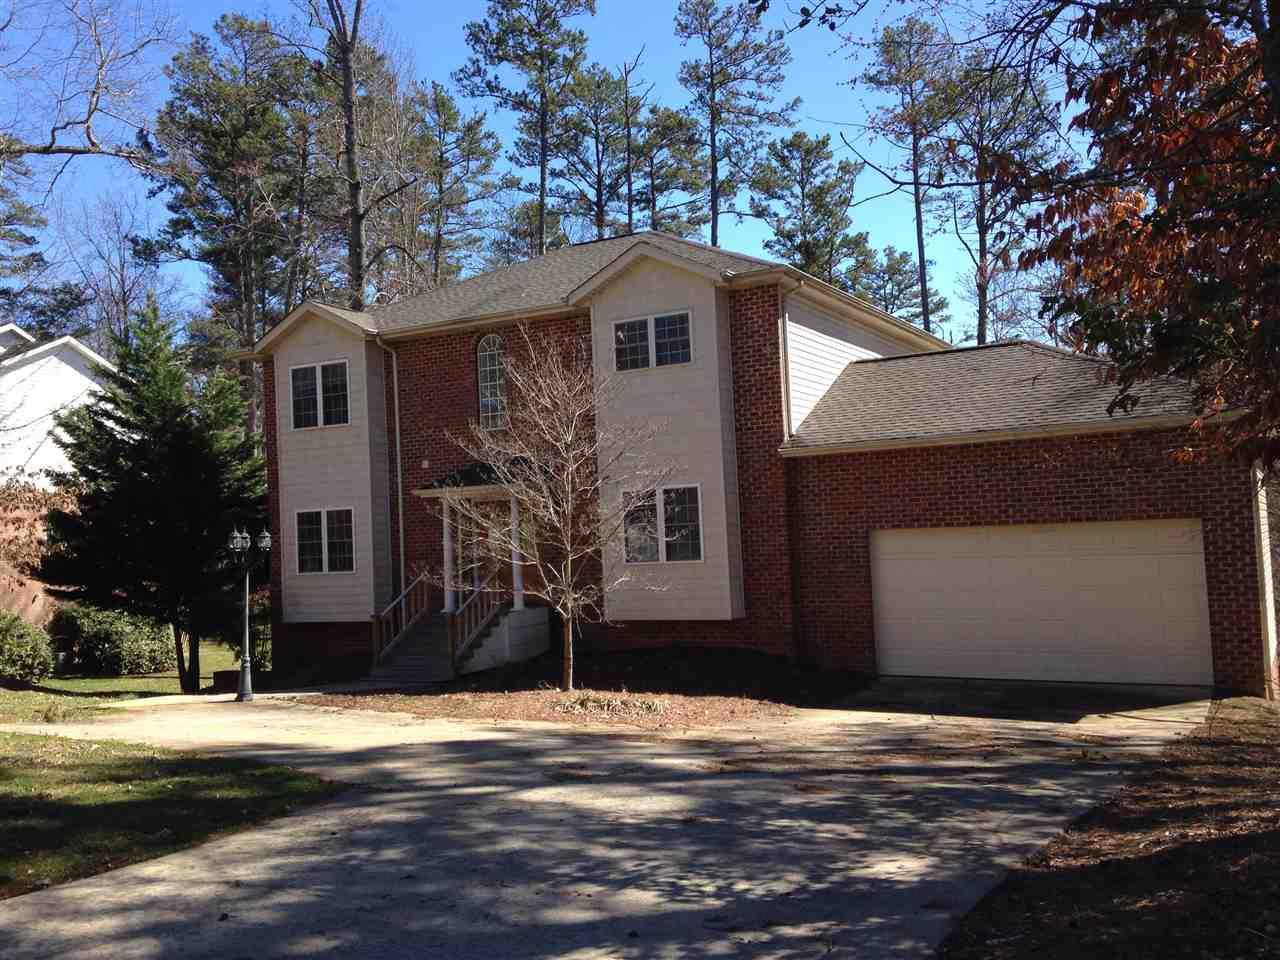 Real Estate for Sale, ListingId: 31923657, Hickory,NC28601